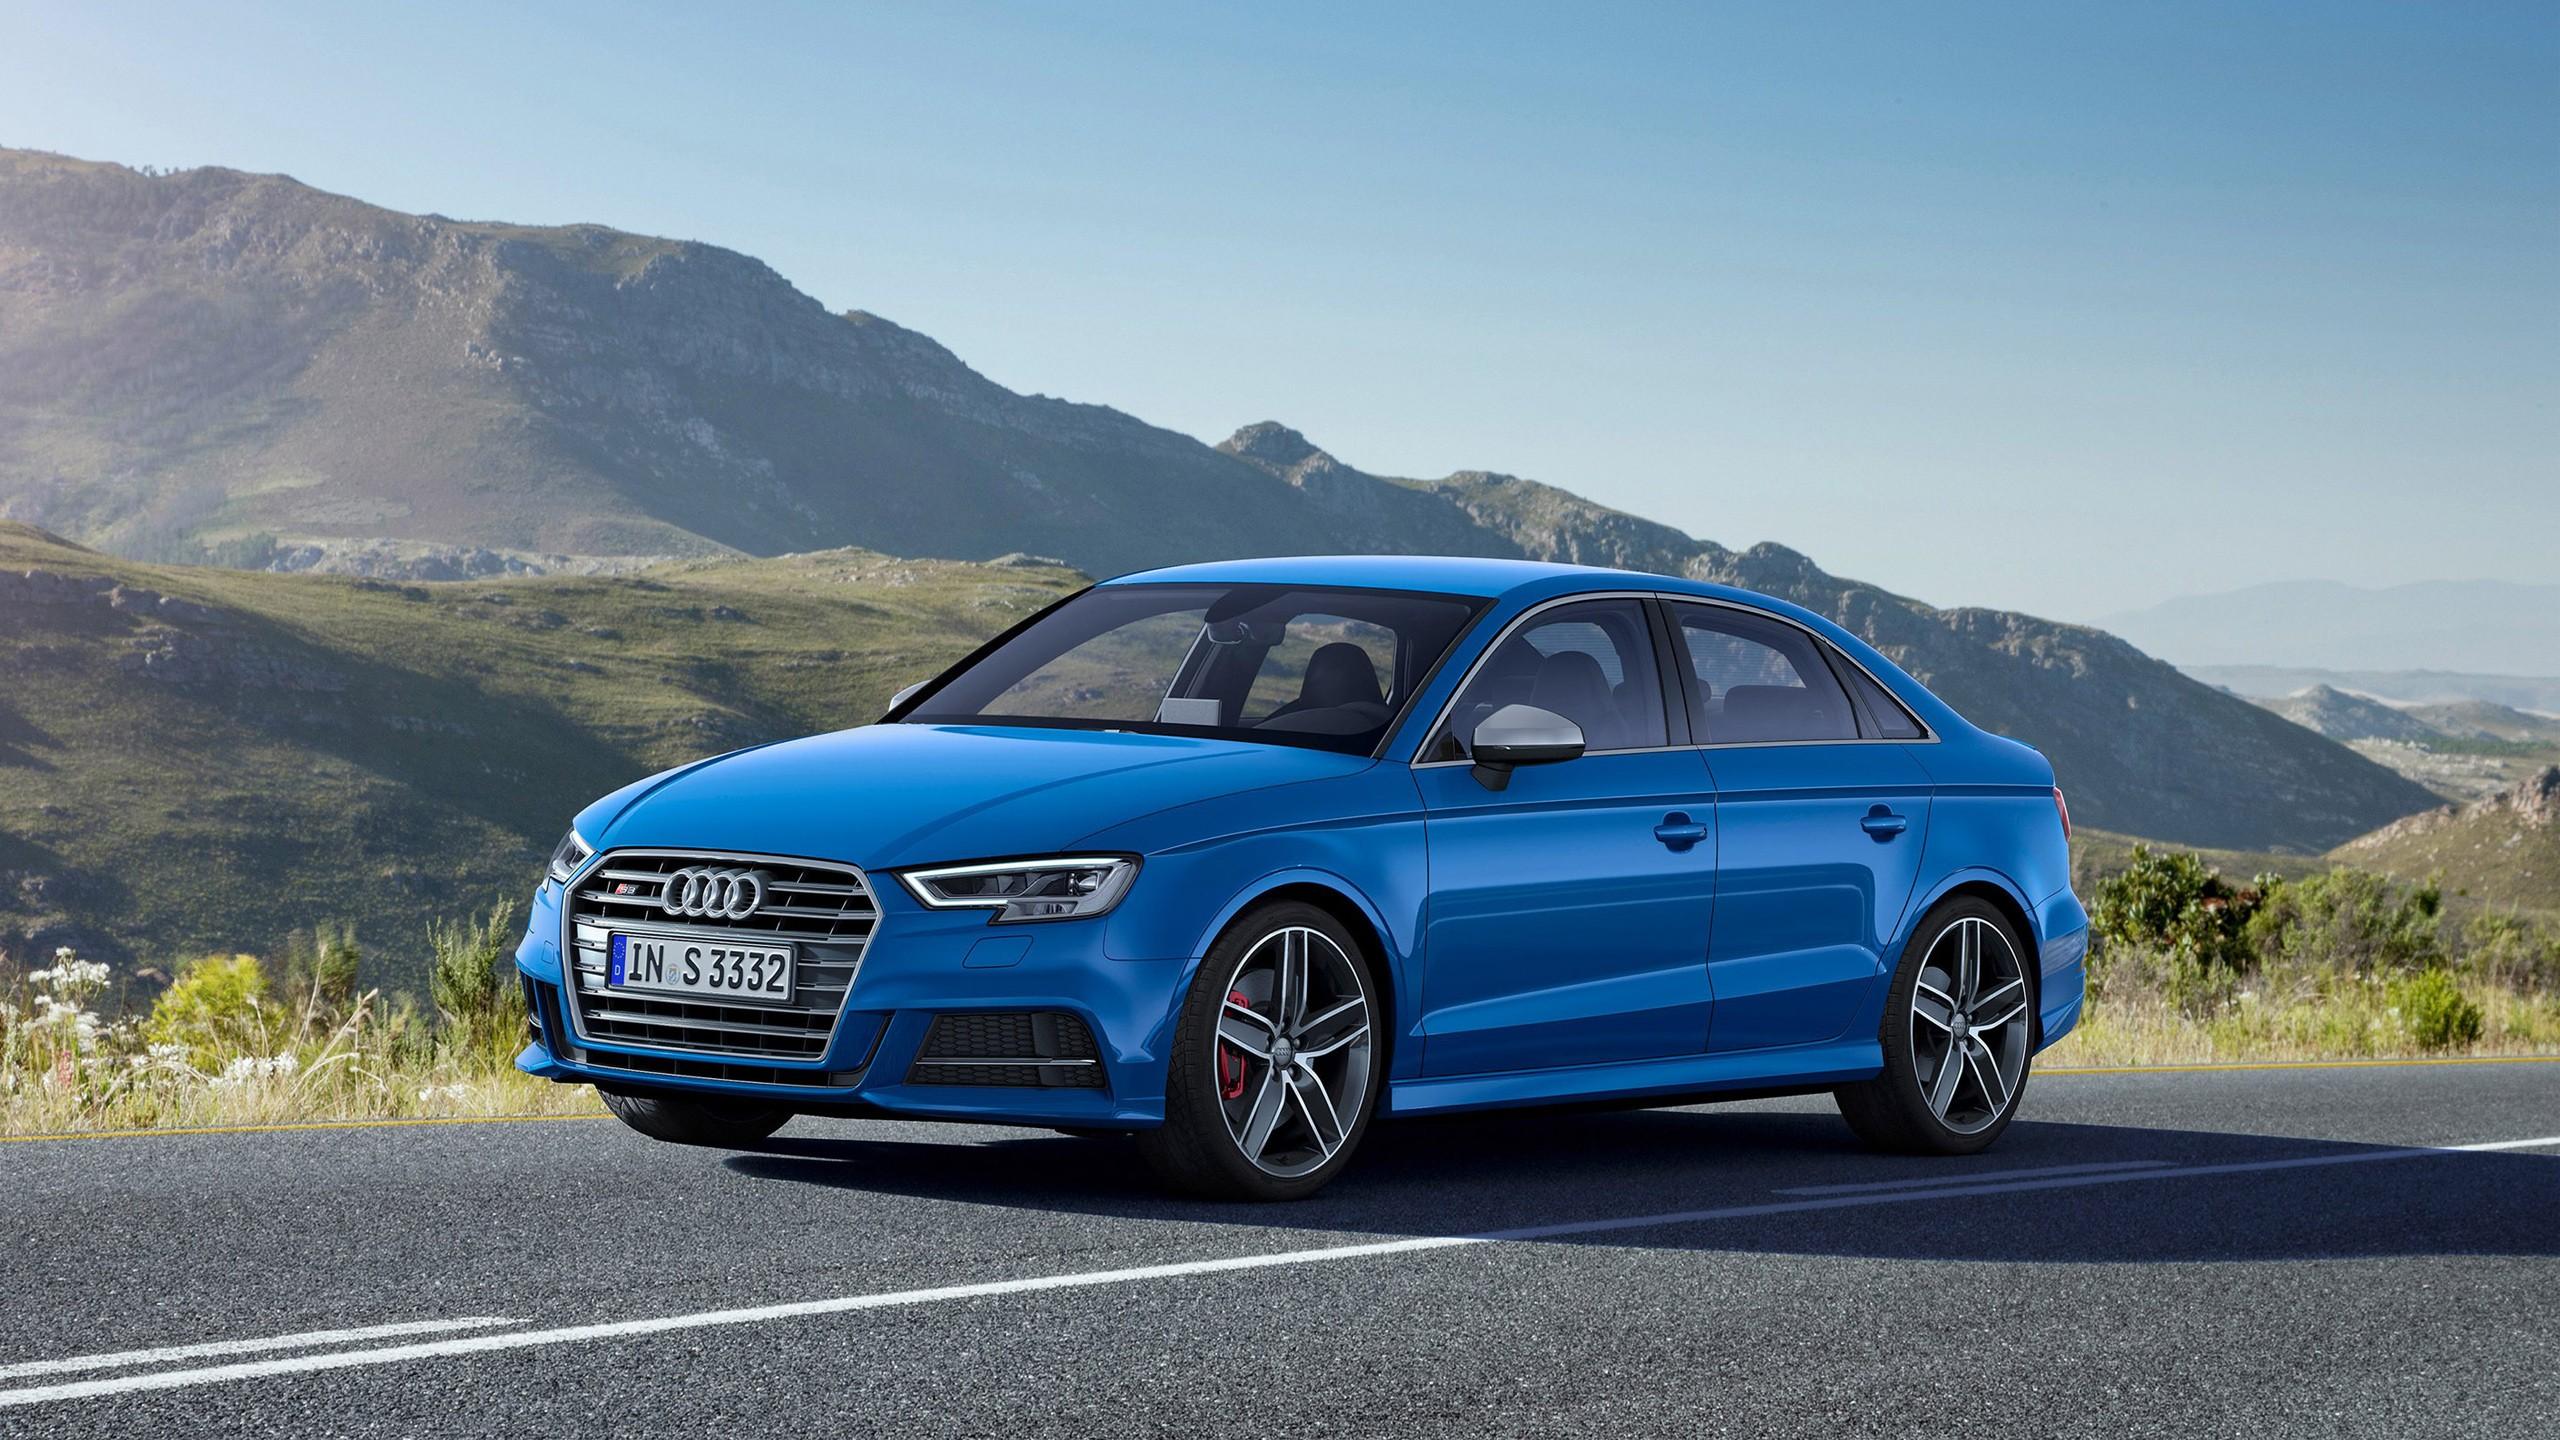 Rolls Royce Car Hd Wallpapers 1080p 2017 Audi S3 Sedan Wallpaper Hd Car Wallpapers Id 6865